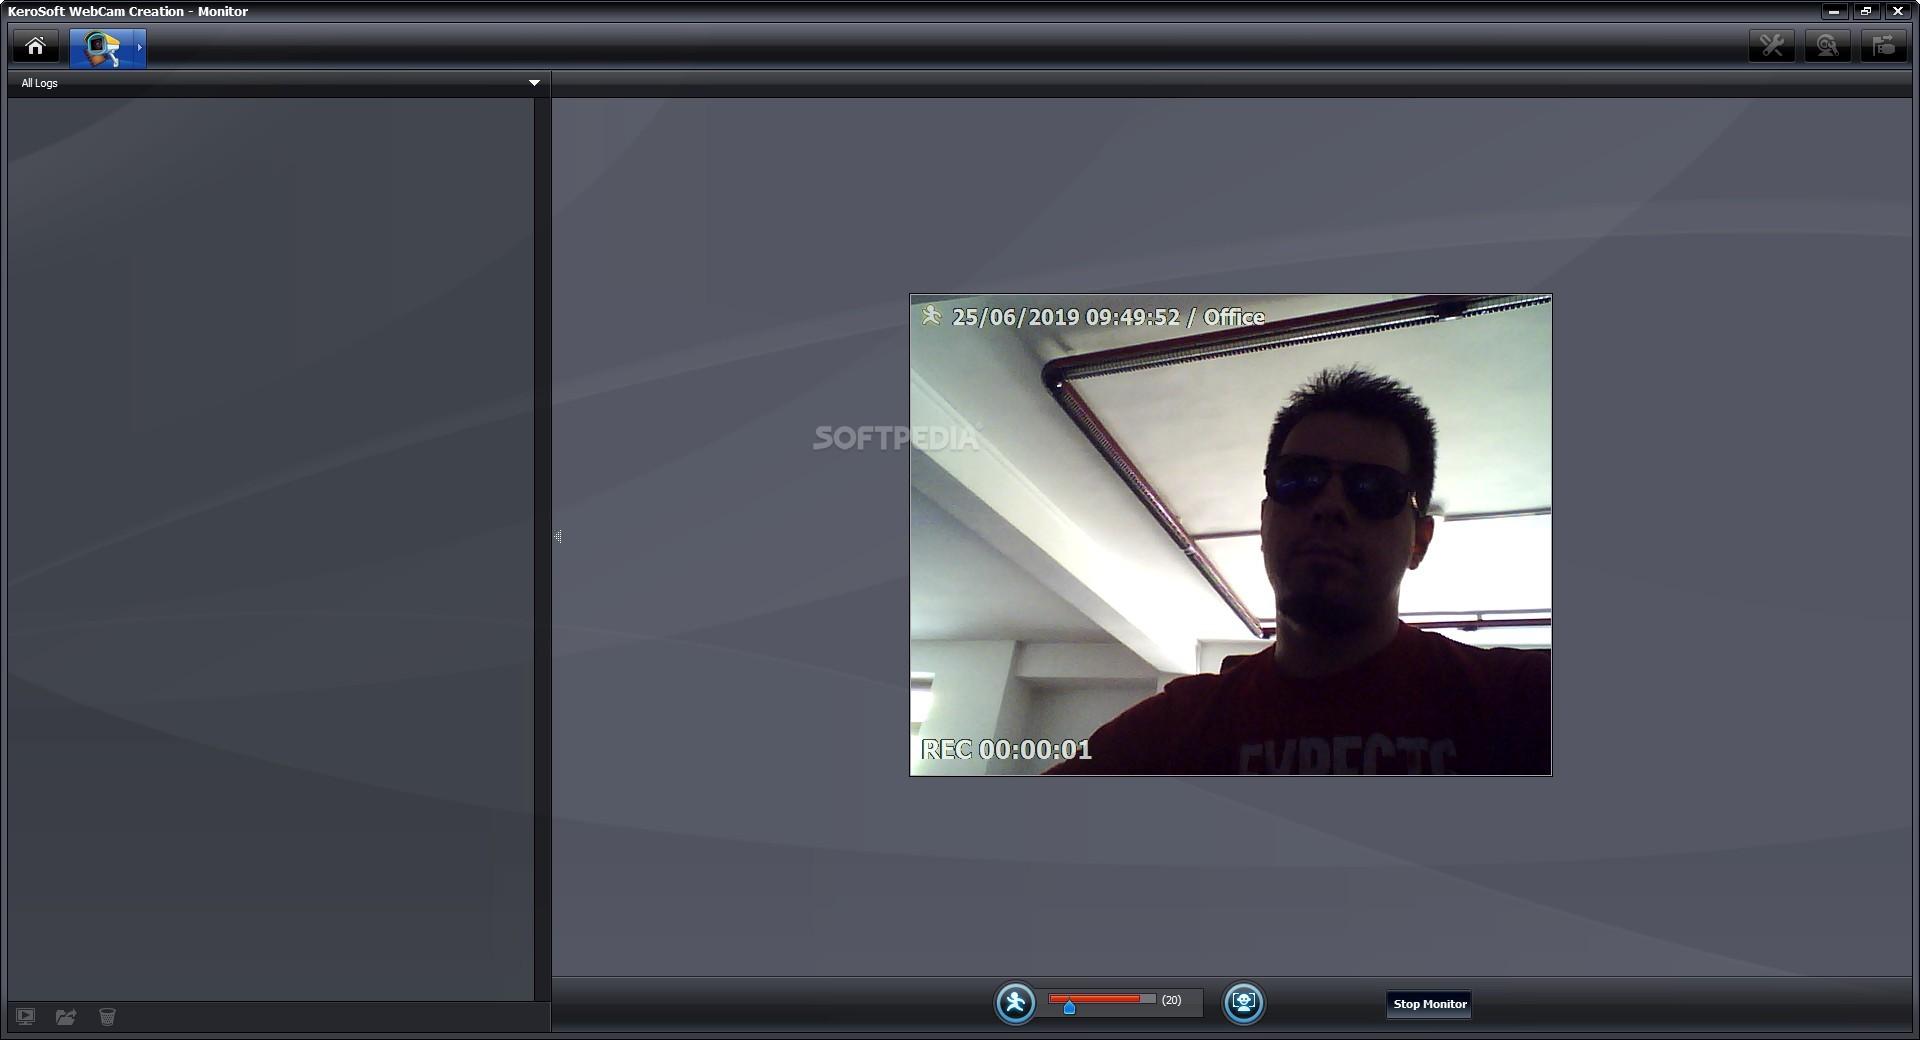 Download KeroSoft WebCam Creation 5 0 0 1